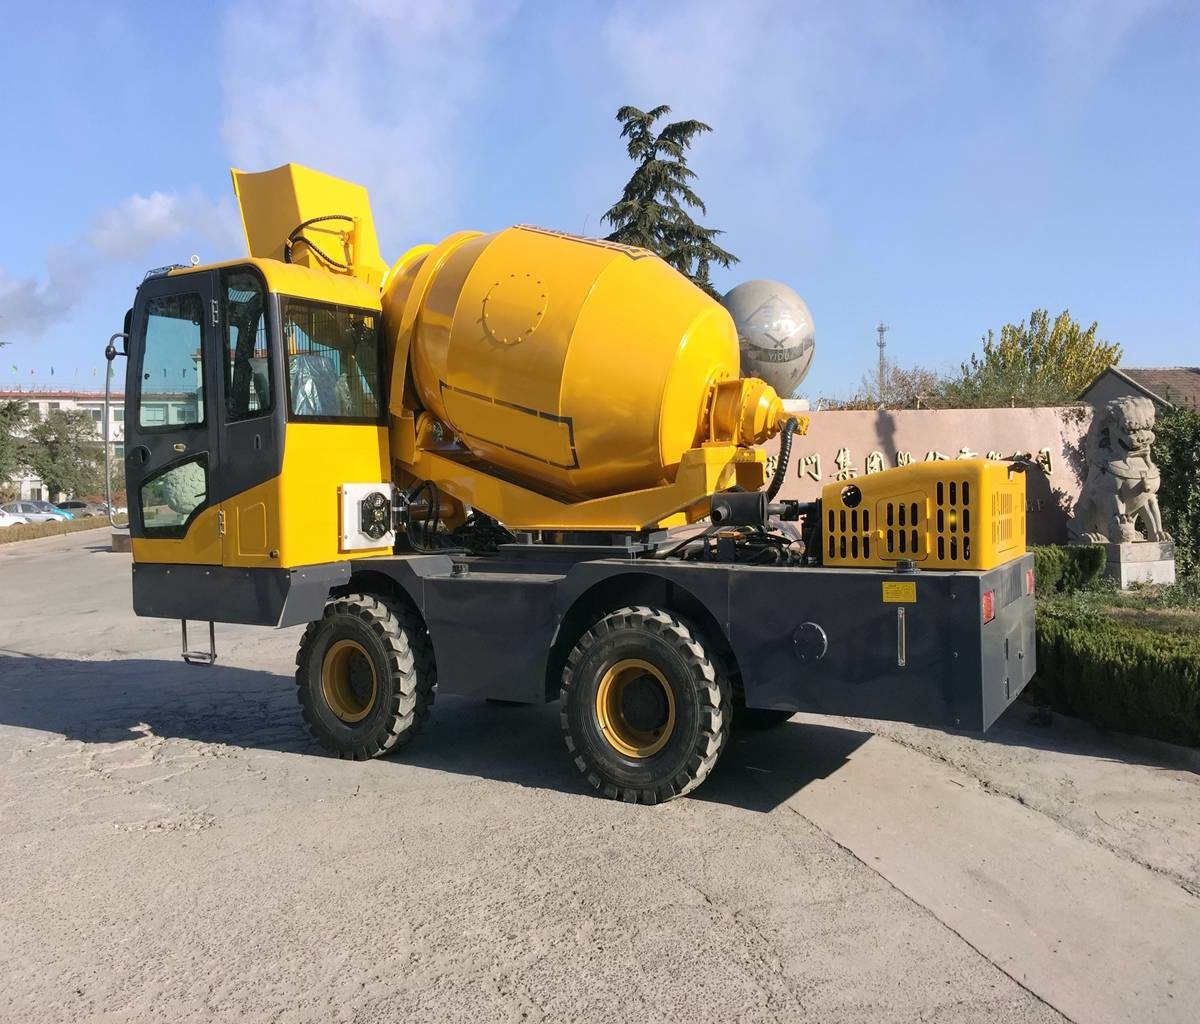 Sales 2.5 M3 Batch Self-loading Concrete Mixer, Buy 2.5 M3 Batch Self-loading Concrete Mixer, 2.5 M3 Batch Self-loading Concrete Mixer Factory, 2.5 M3 Batch Self-loading Concrete Mixer Brands